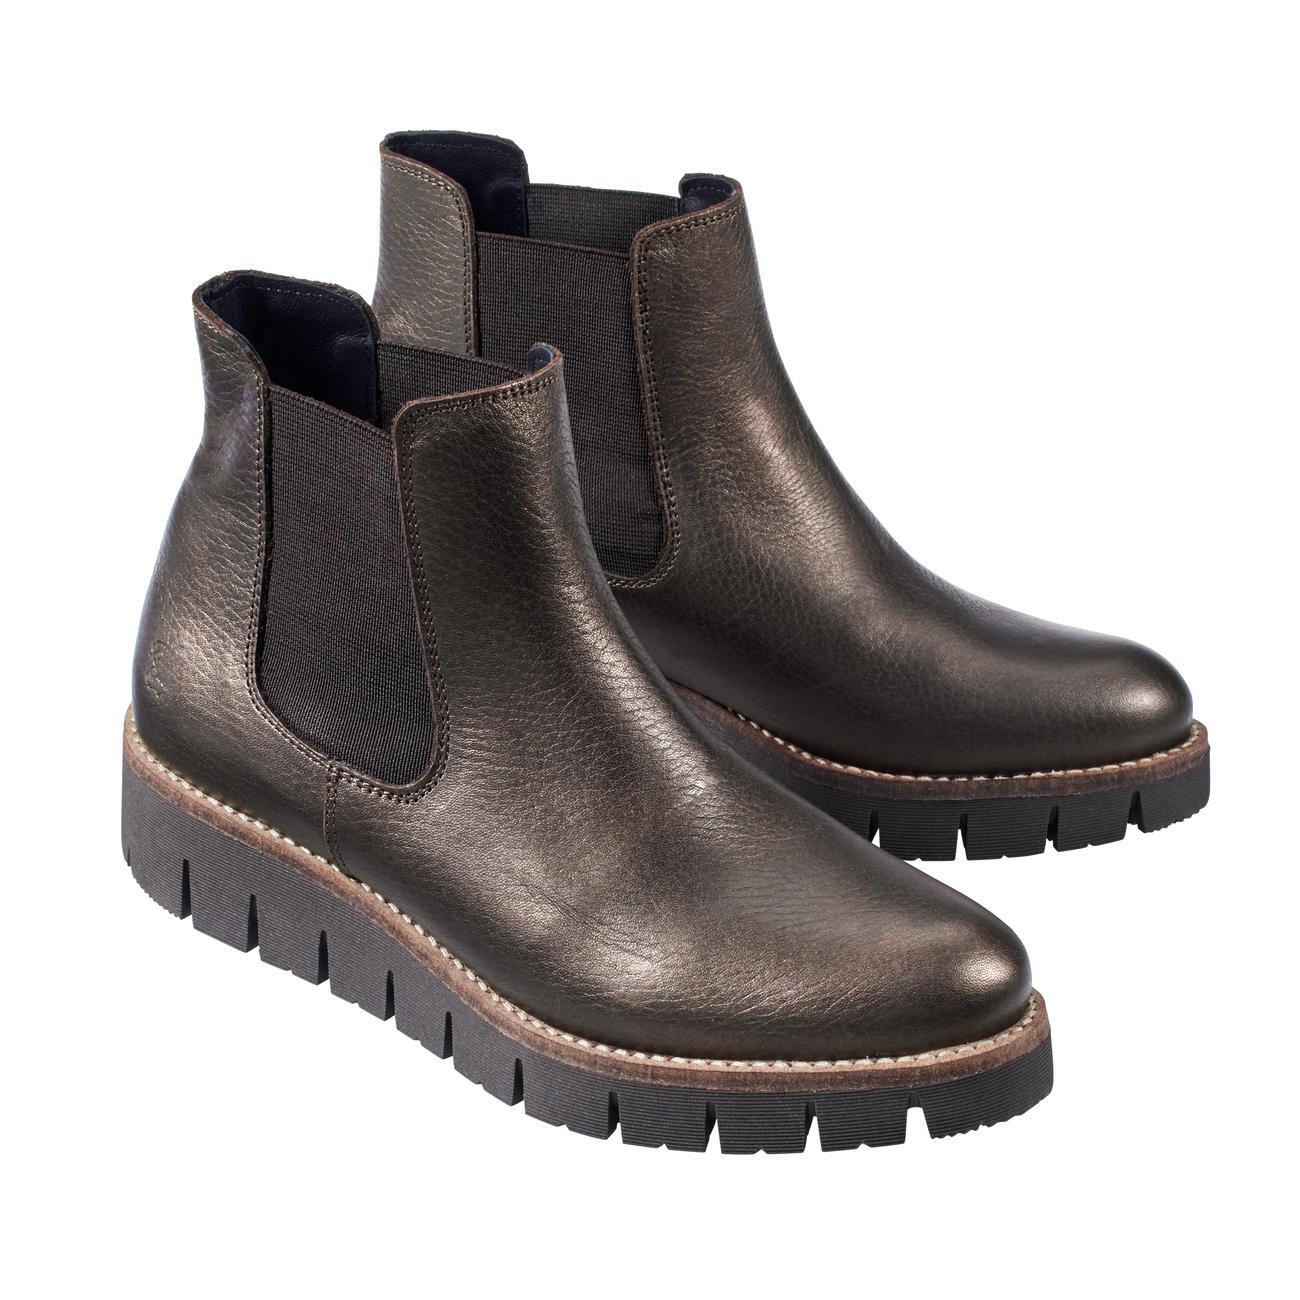 promo code 21c52 c44f4 Apple of Eden Chelsea Boot   Discover fashion classics